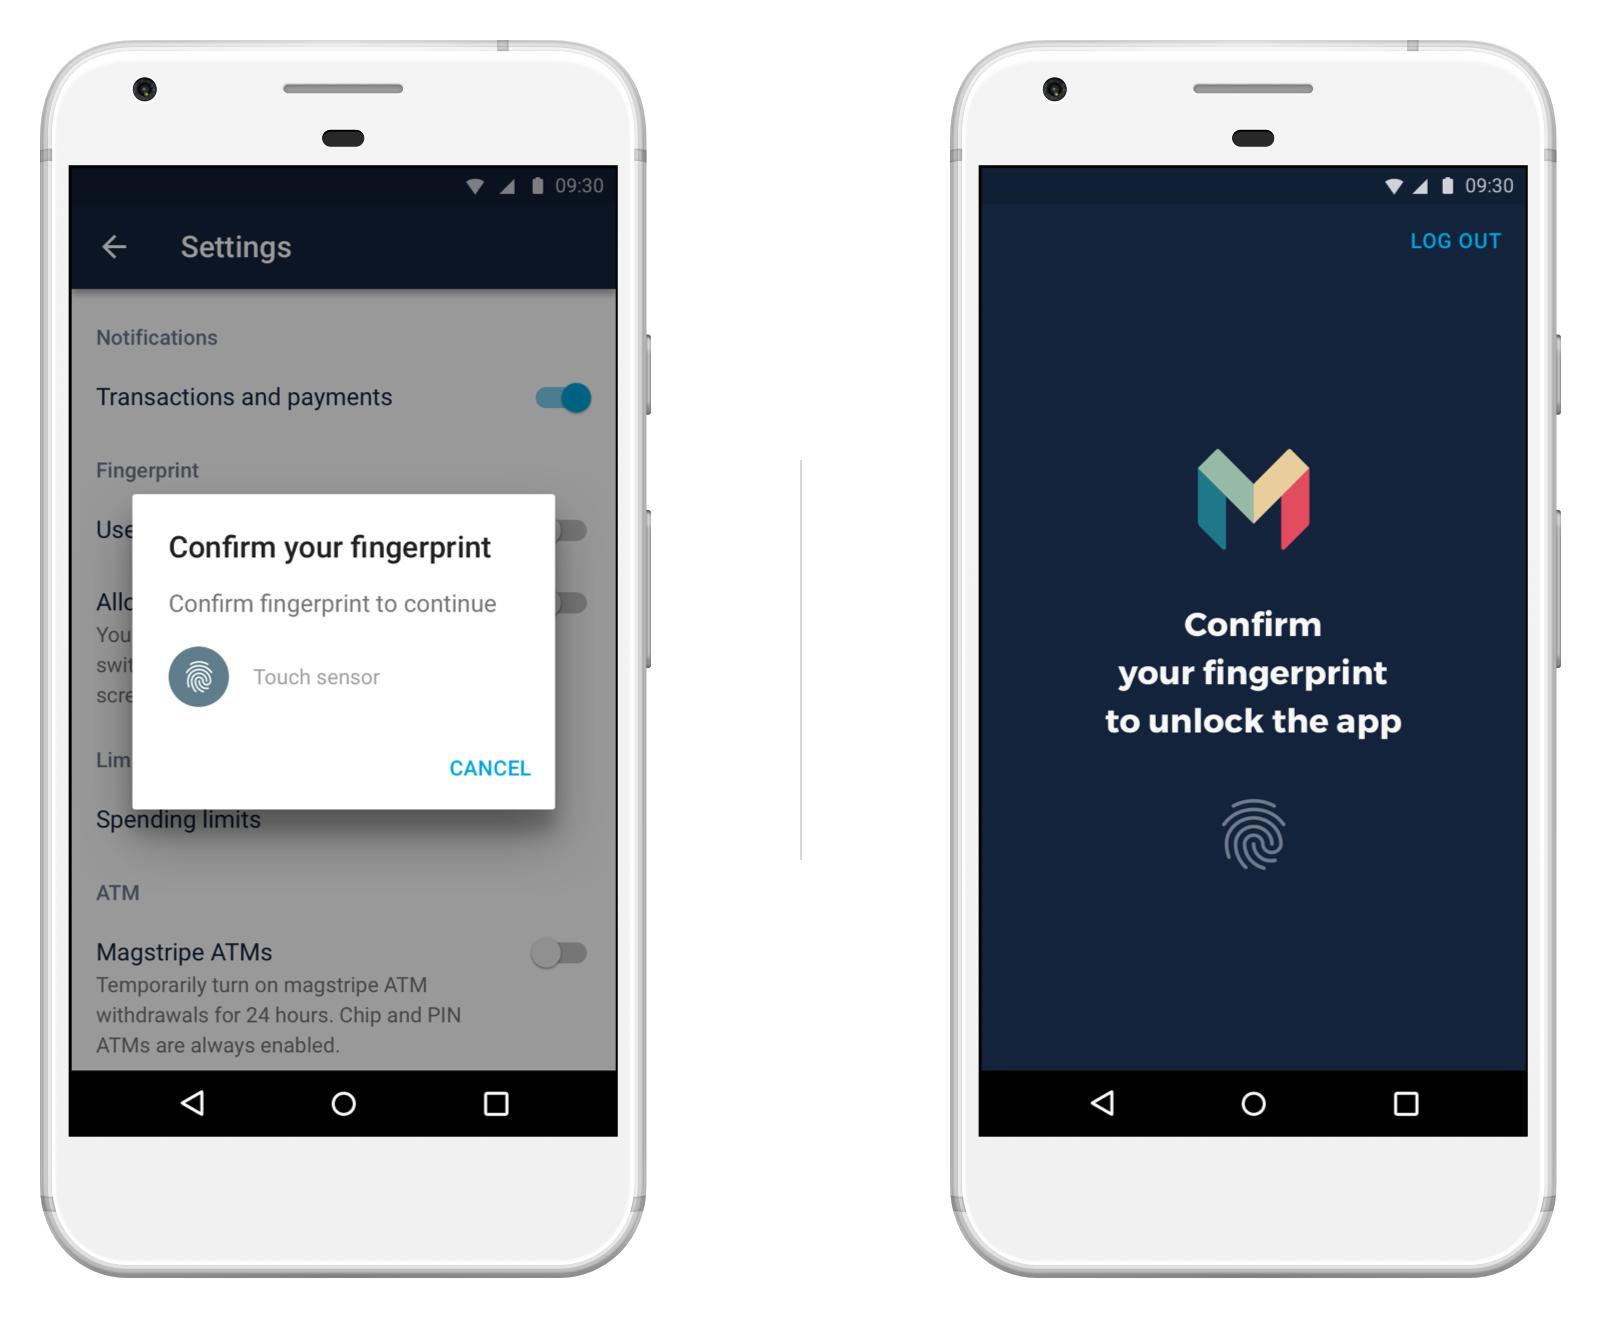 Screen showing fingerprint unlock in the Monzo Android app